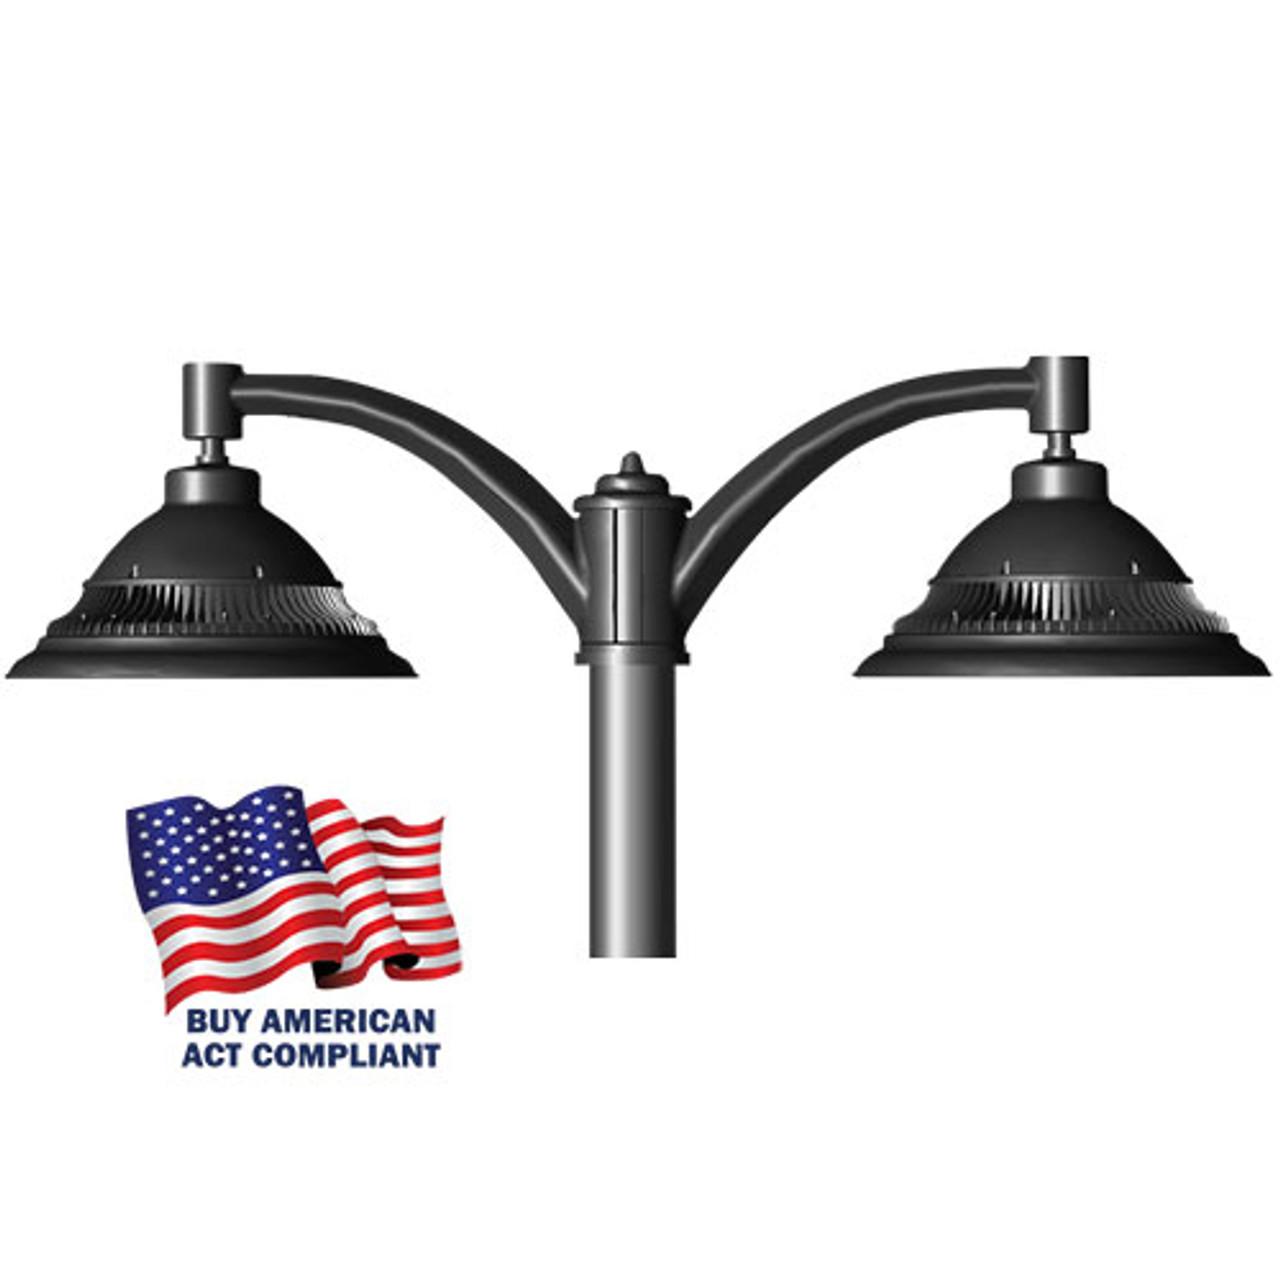 Pendant LED Decorative Pole Mounted 65 Watt